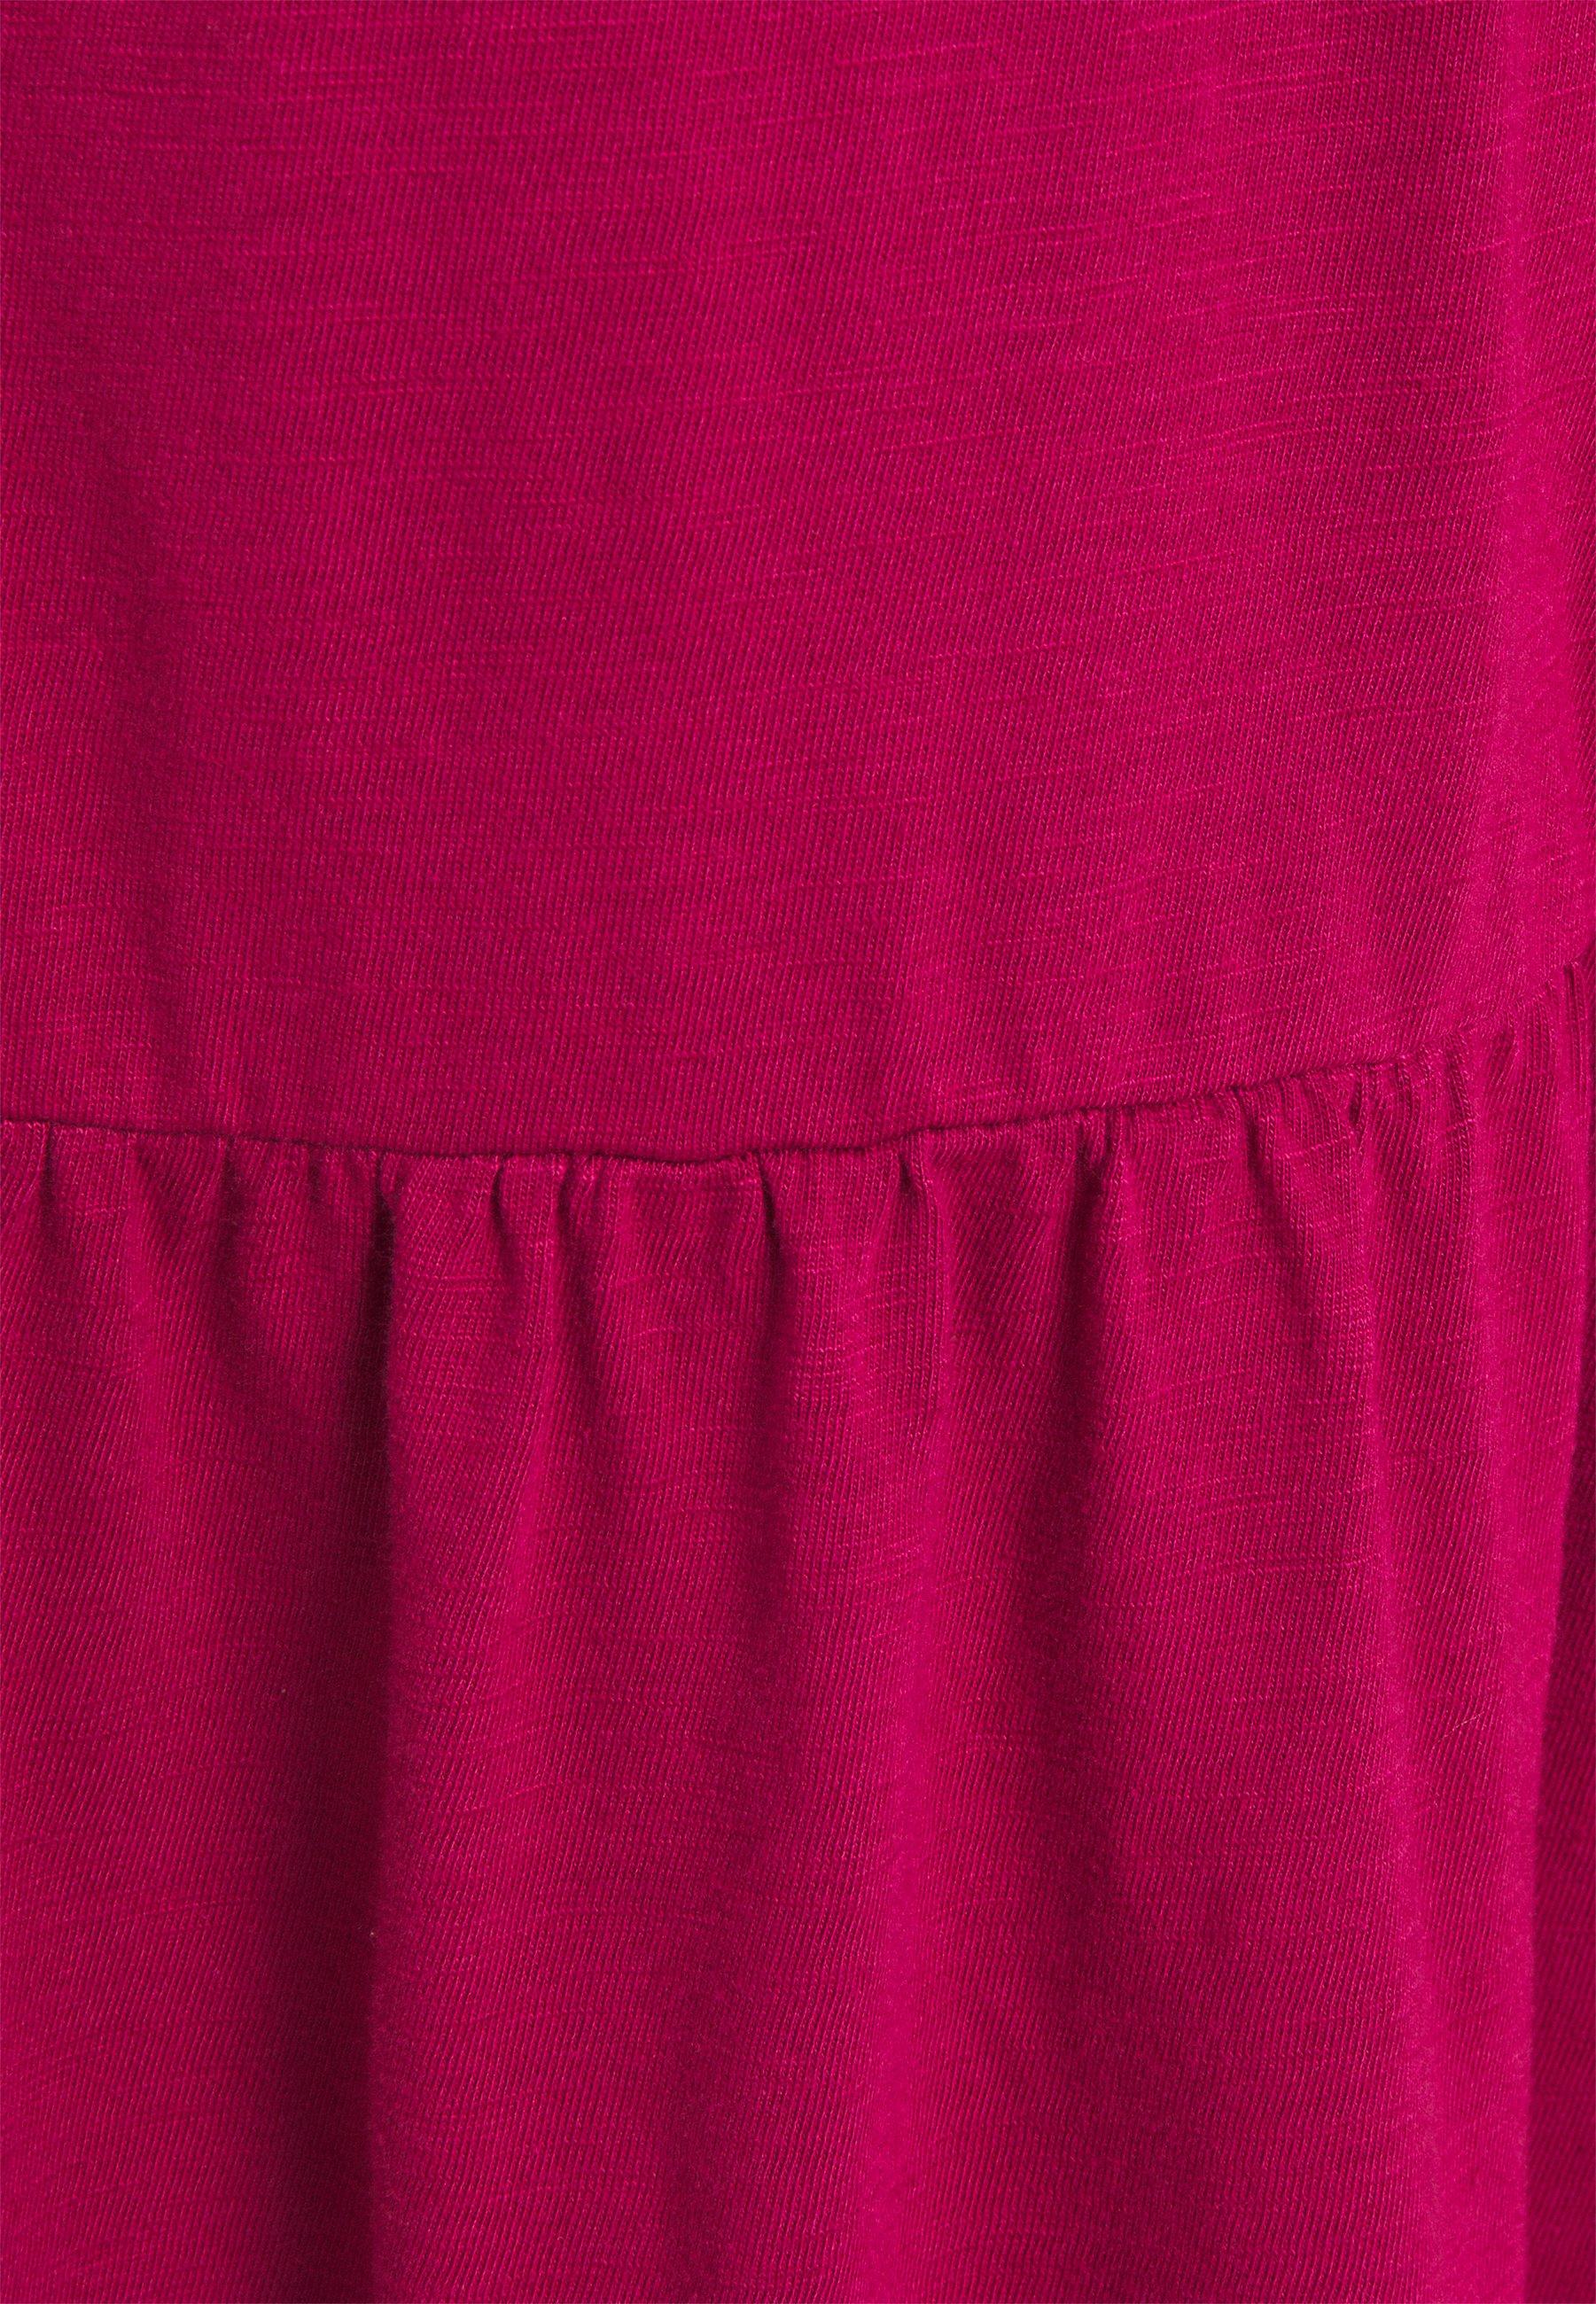 GAP TIERD Jerseykleid ruby pink/pink